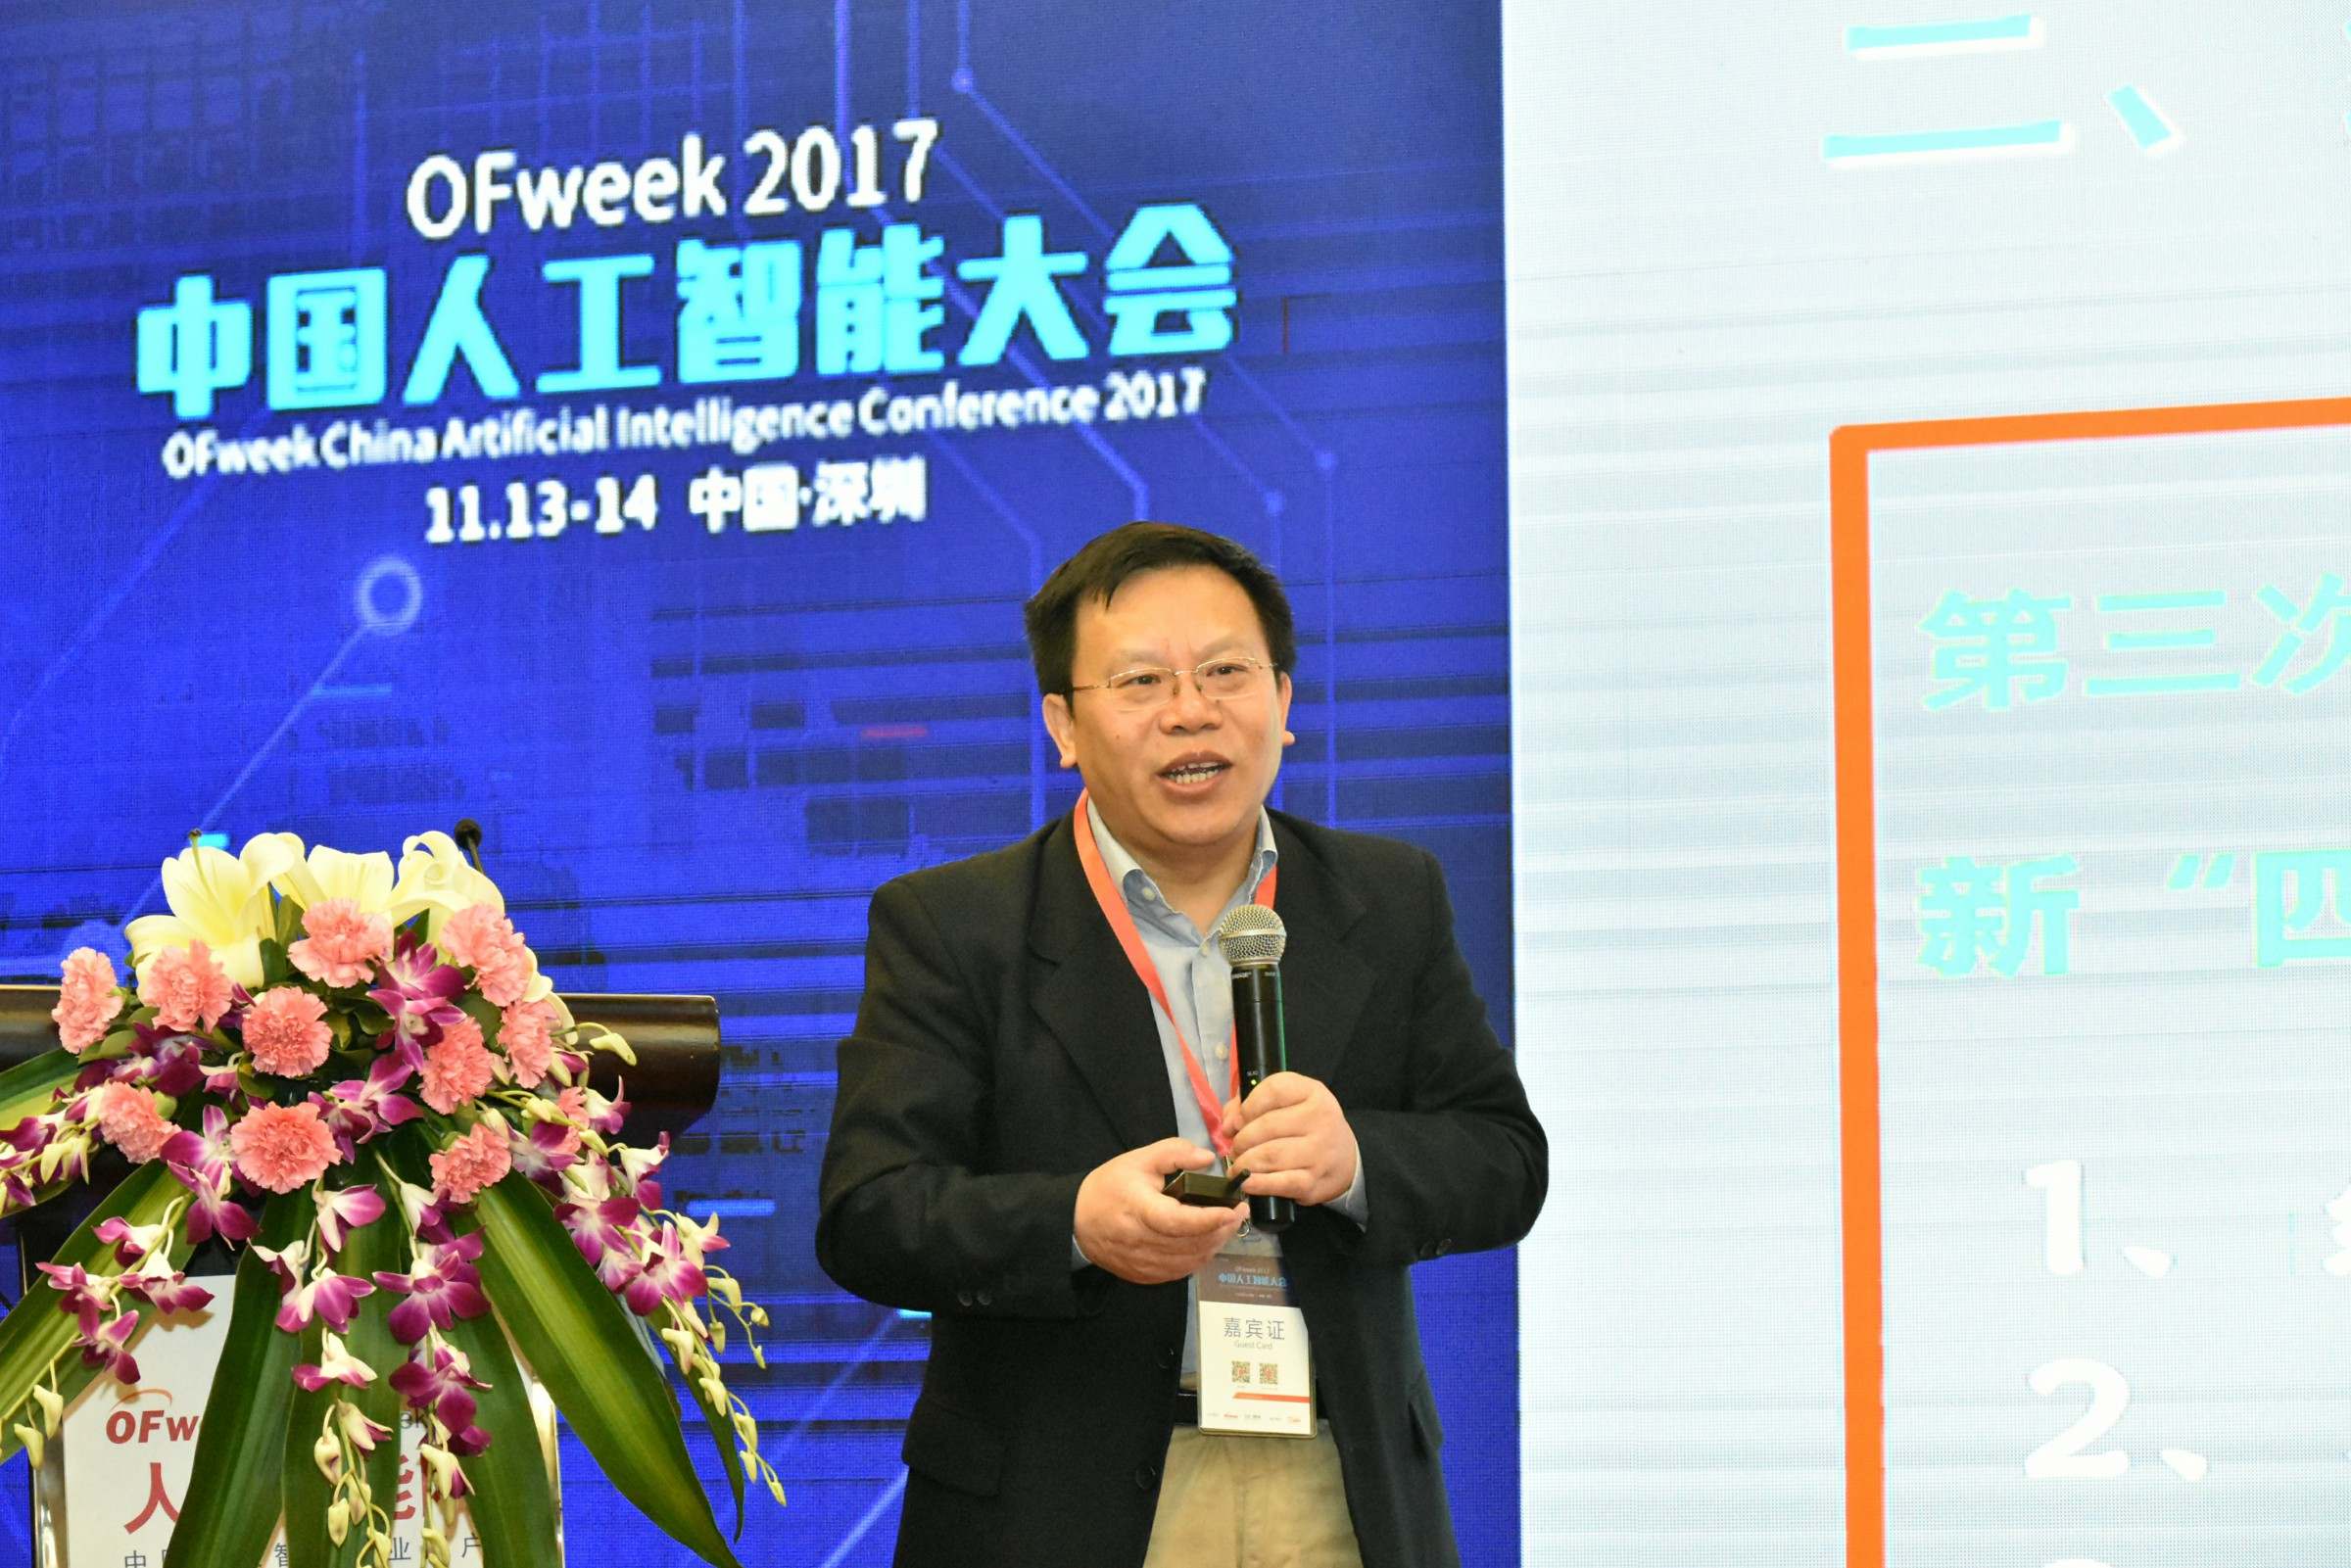 OFweek 2017中国人工智能大会成功举办